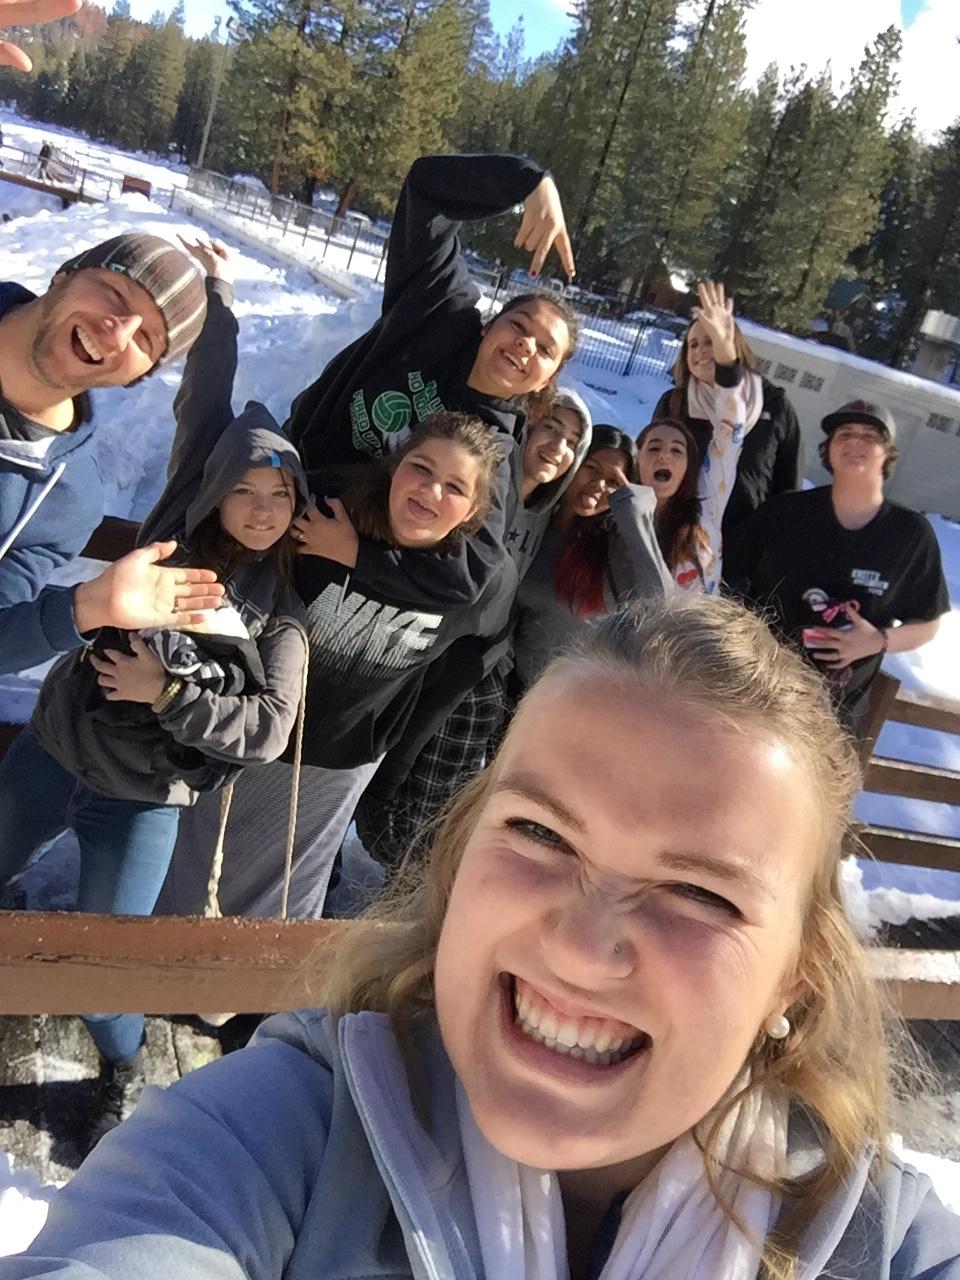 Winter Camp 4_TeenWorks_mentoring_teens_youth_Tuolumne County_Sonora_California.JPG